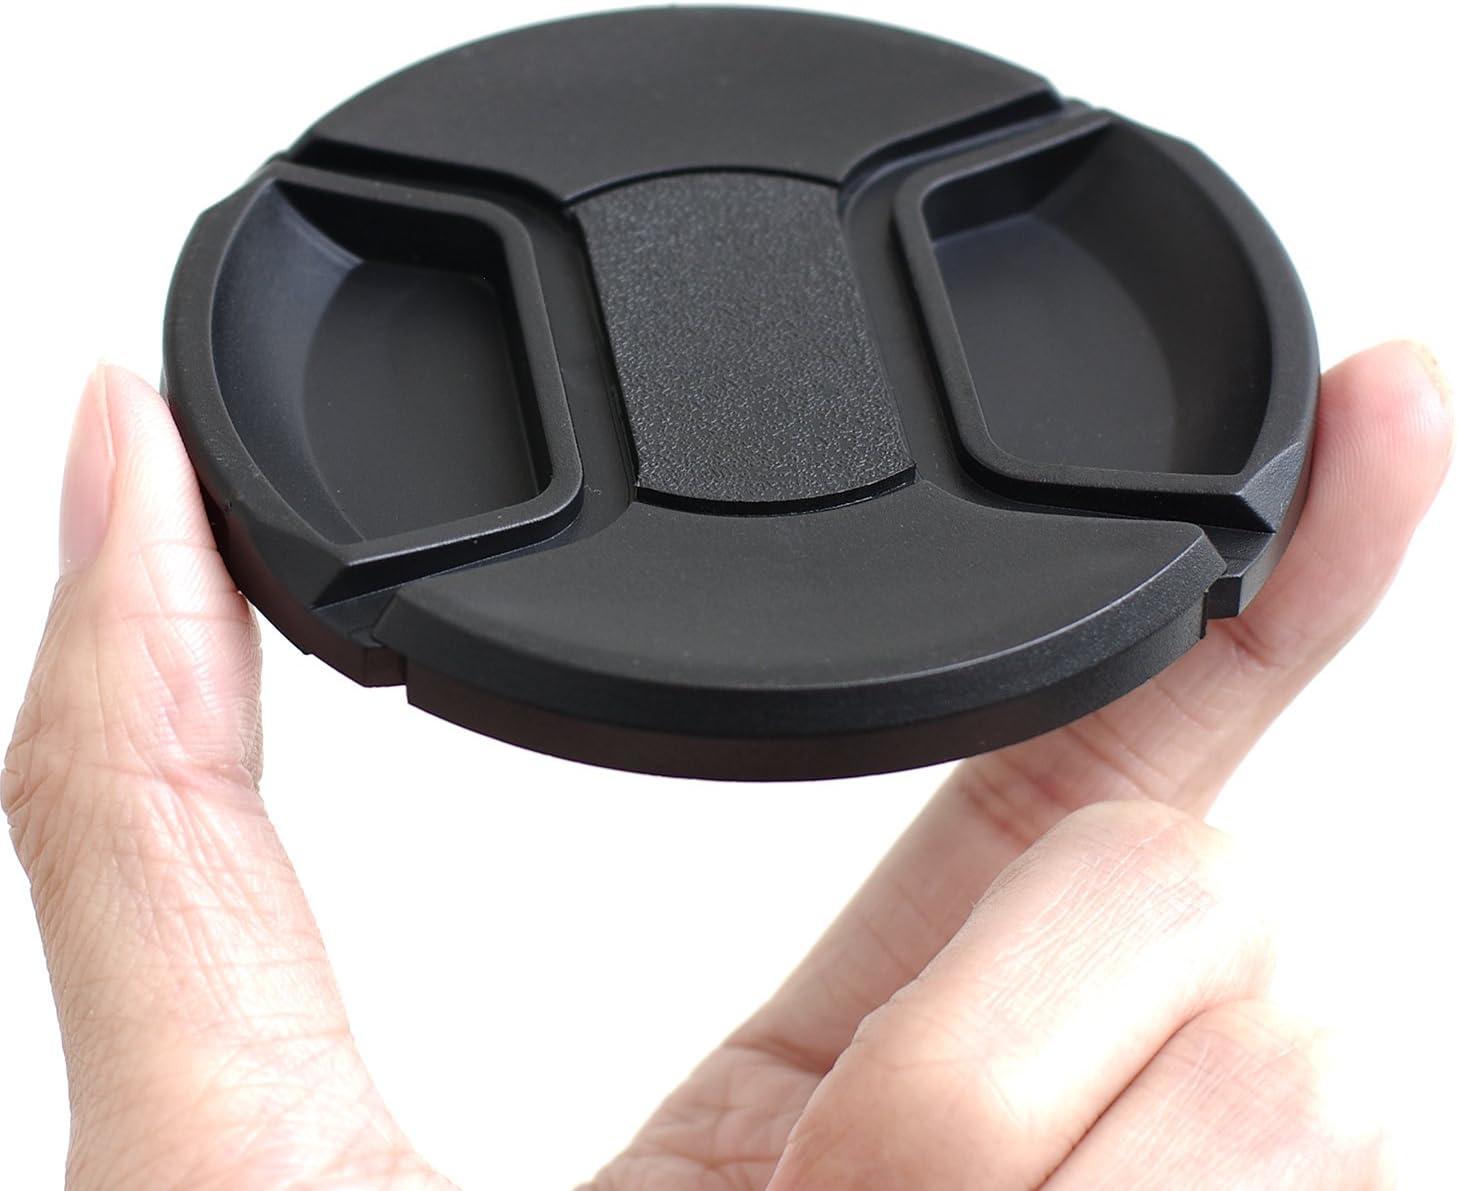 Front Lens Filter Snap On Pinch Cap Protector Cover for DSLR SLR Camera Lens 77+82 77MM x 2 + 82MM x 2 IMZ Lens Cap Bundle